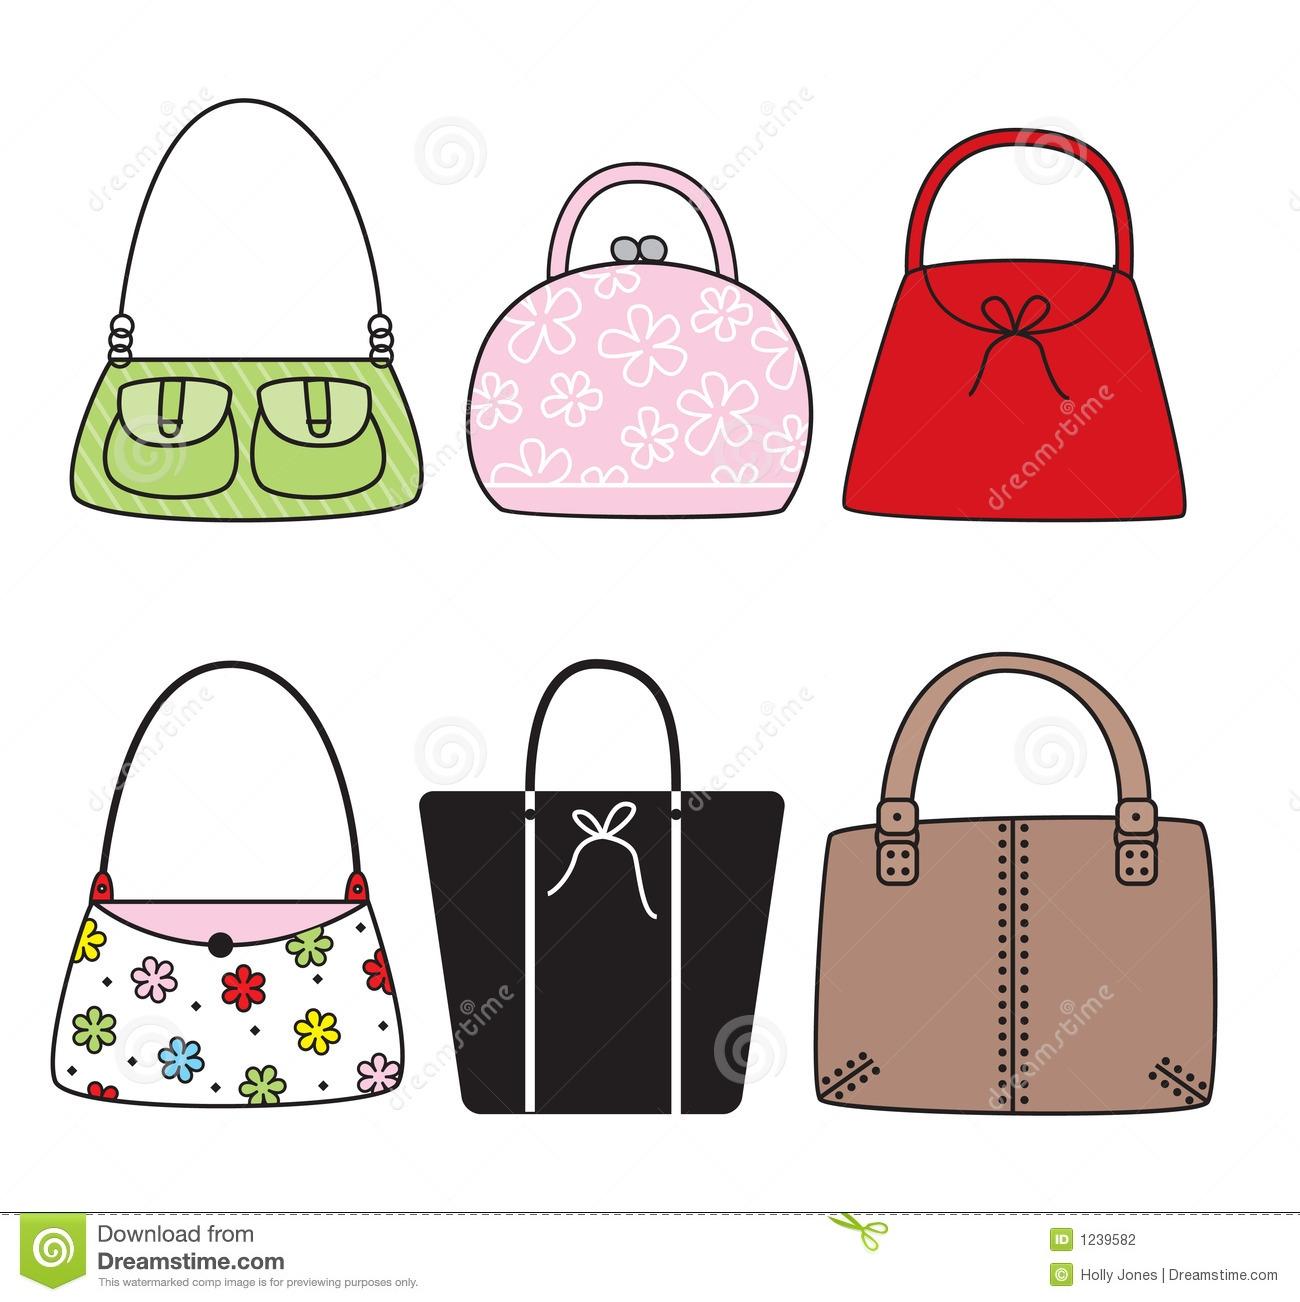 Purse clipart New Free handbag clipart Clipart Collection » Clipart.